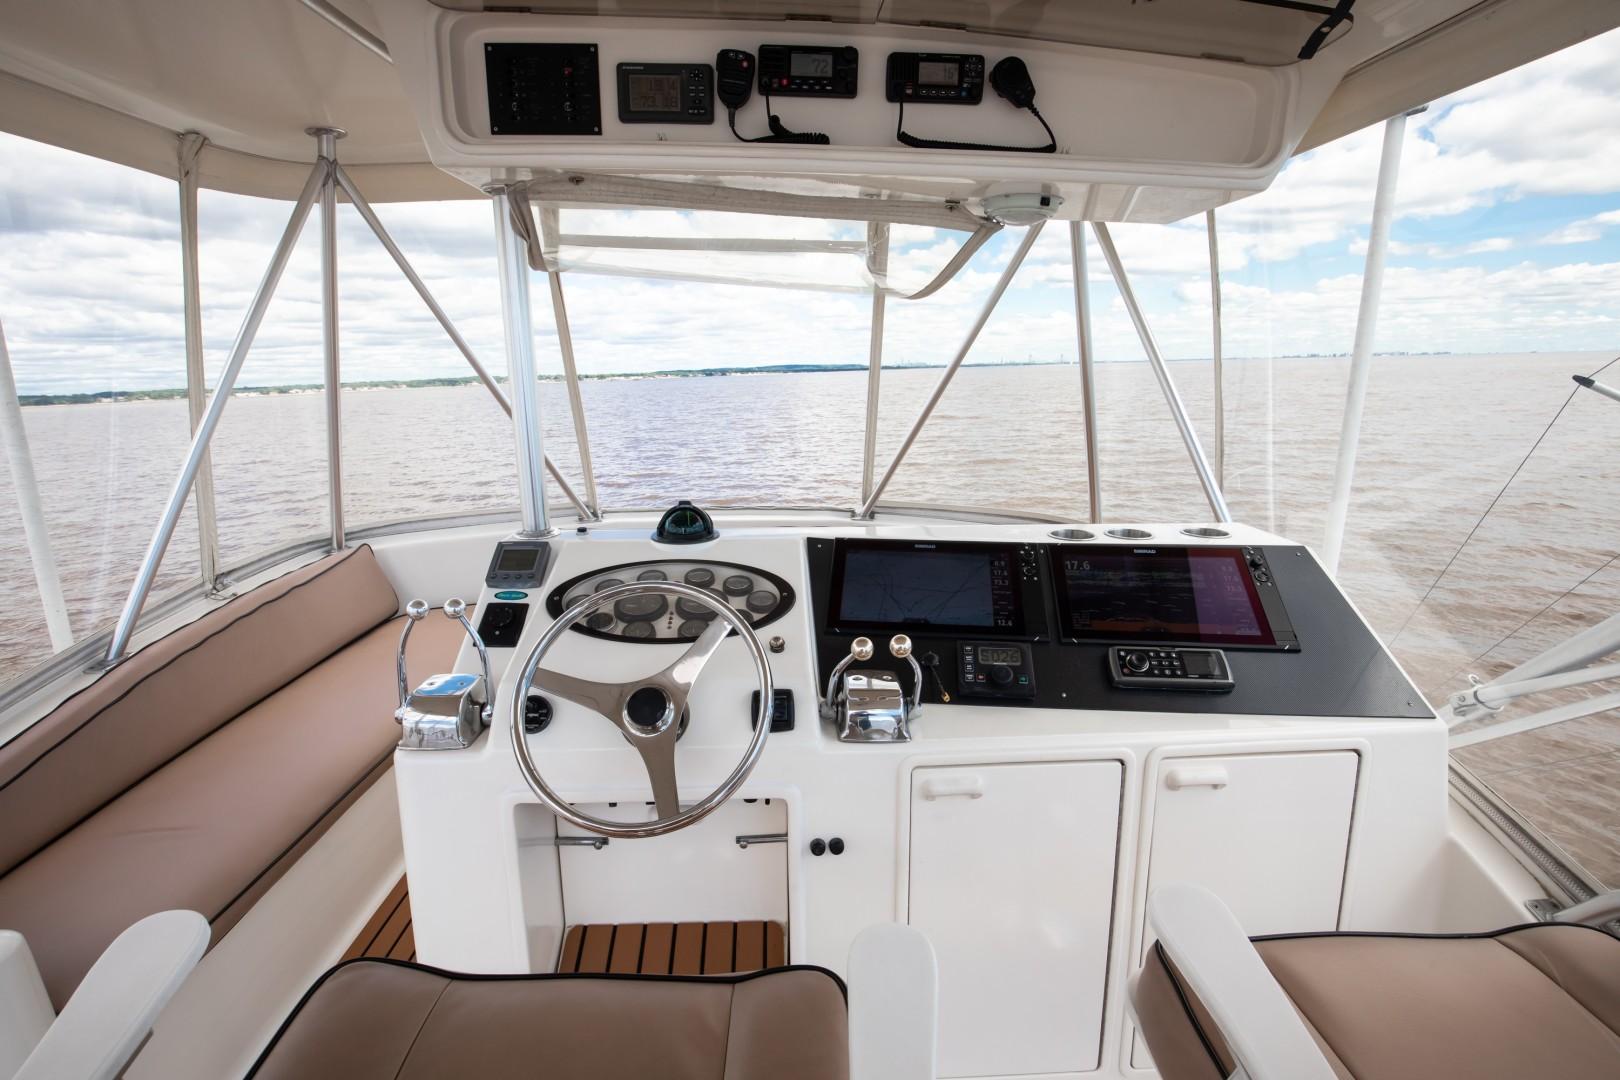 Ocean Yachts 40 - Top Shot - Tower Helm